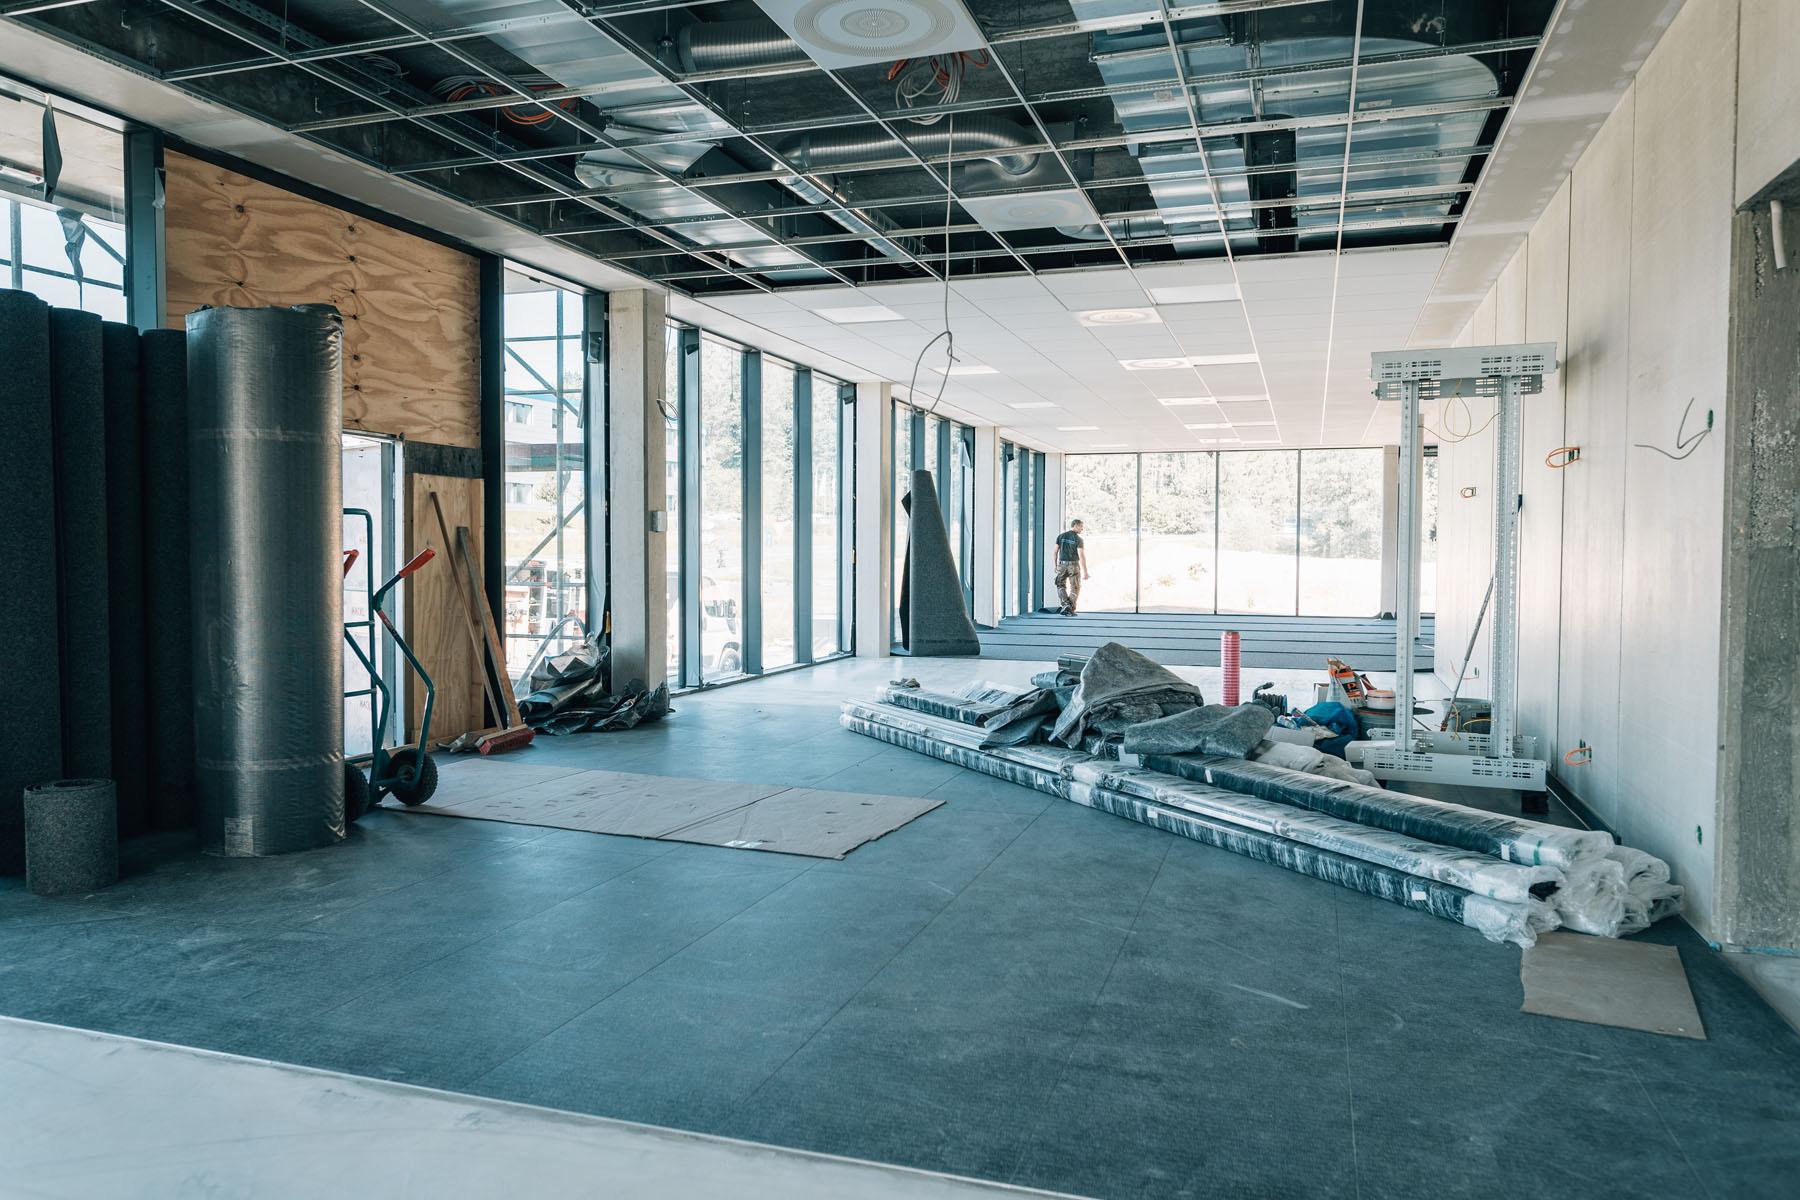 ITES-20190723-Baustellenupdate-02365